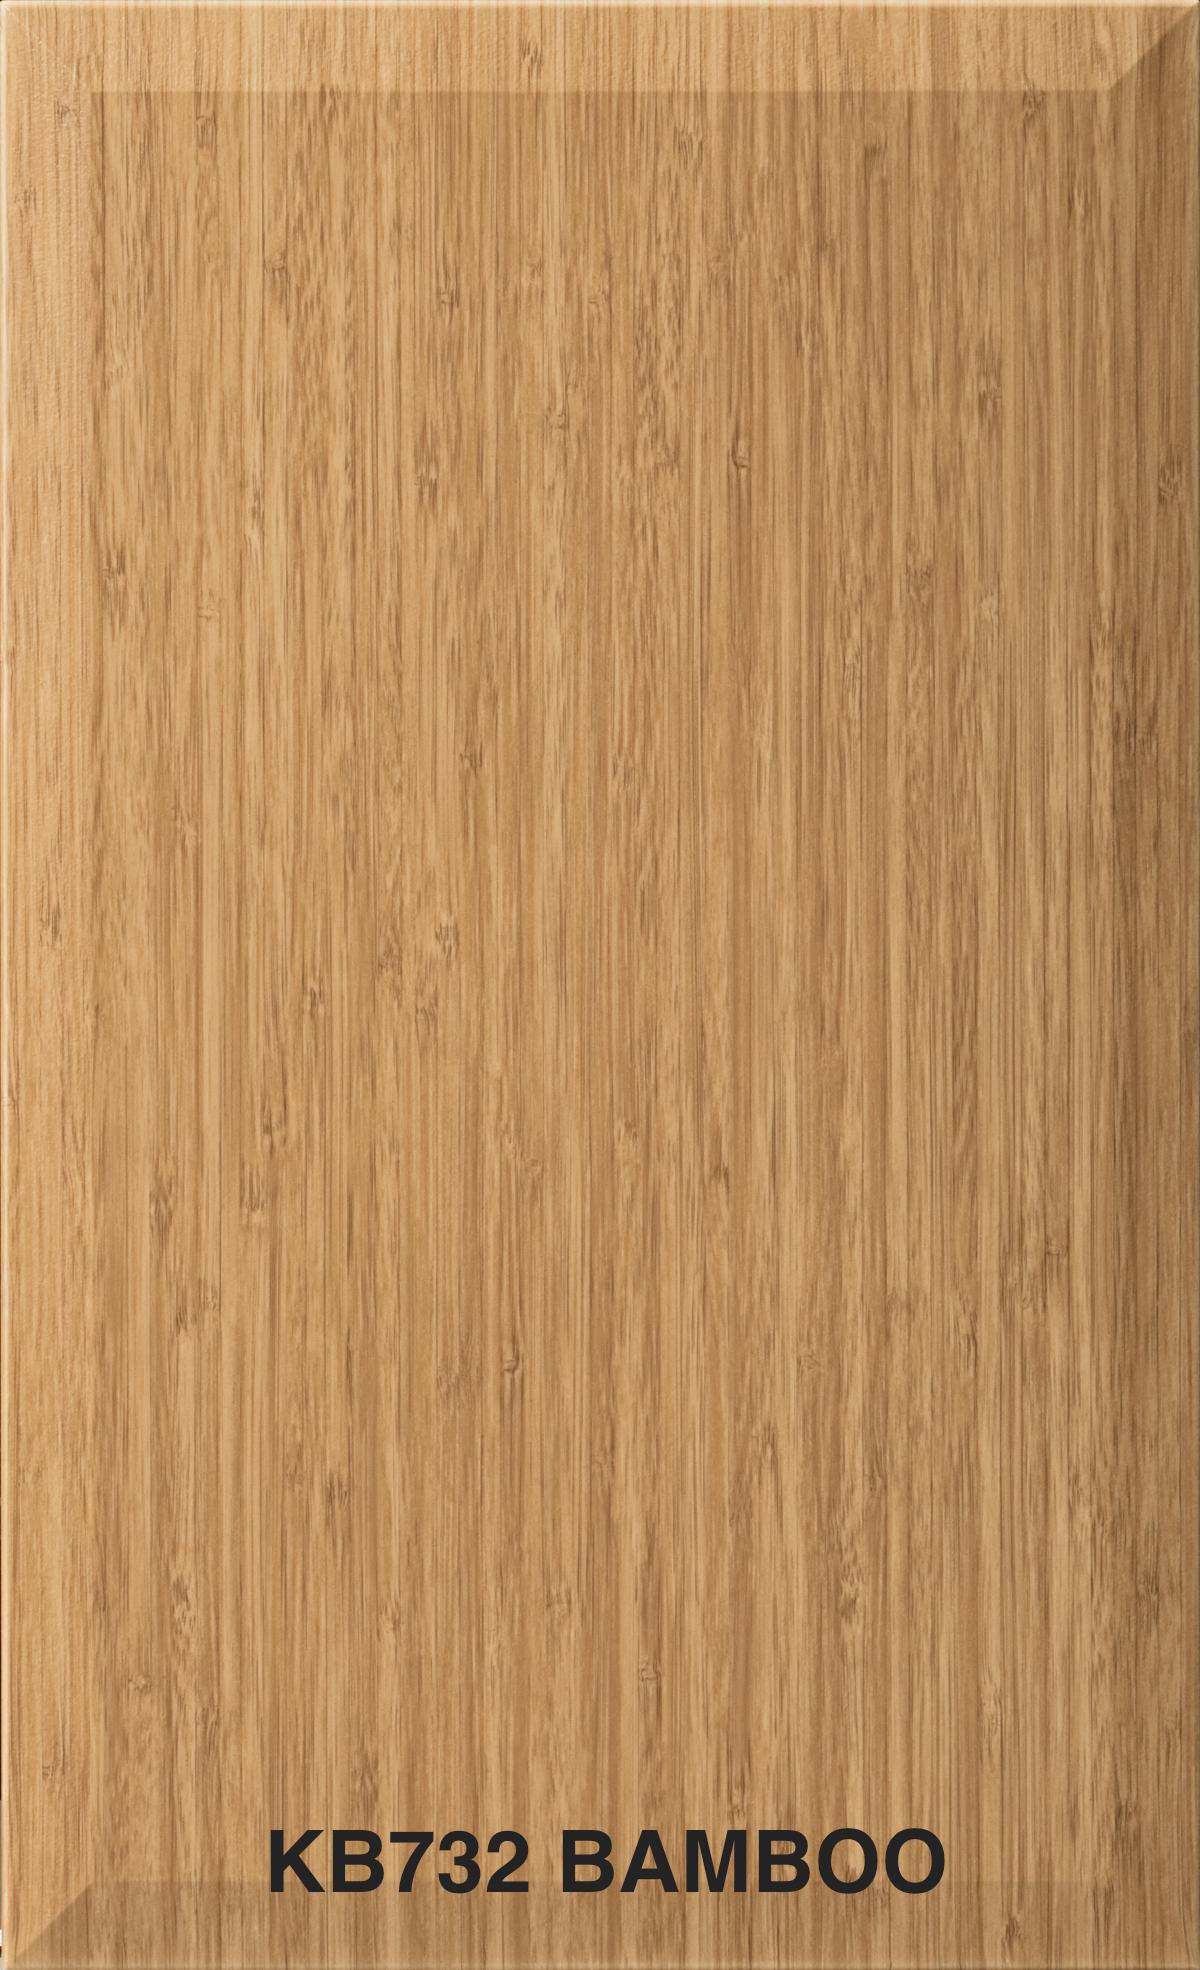 732_KB732_Bamboo_cc.jpg